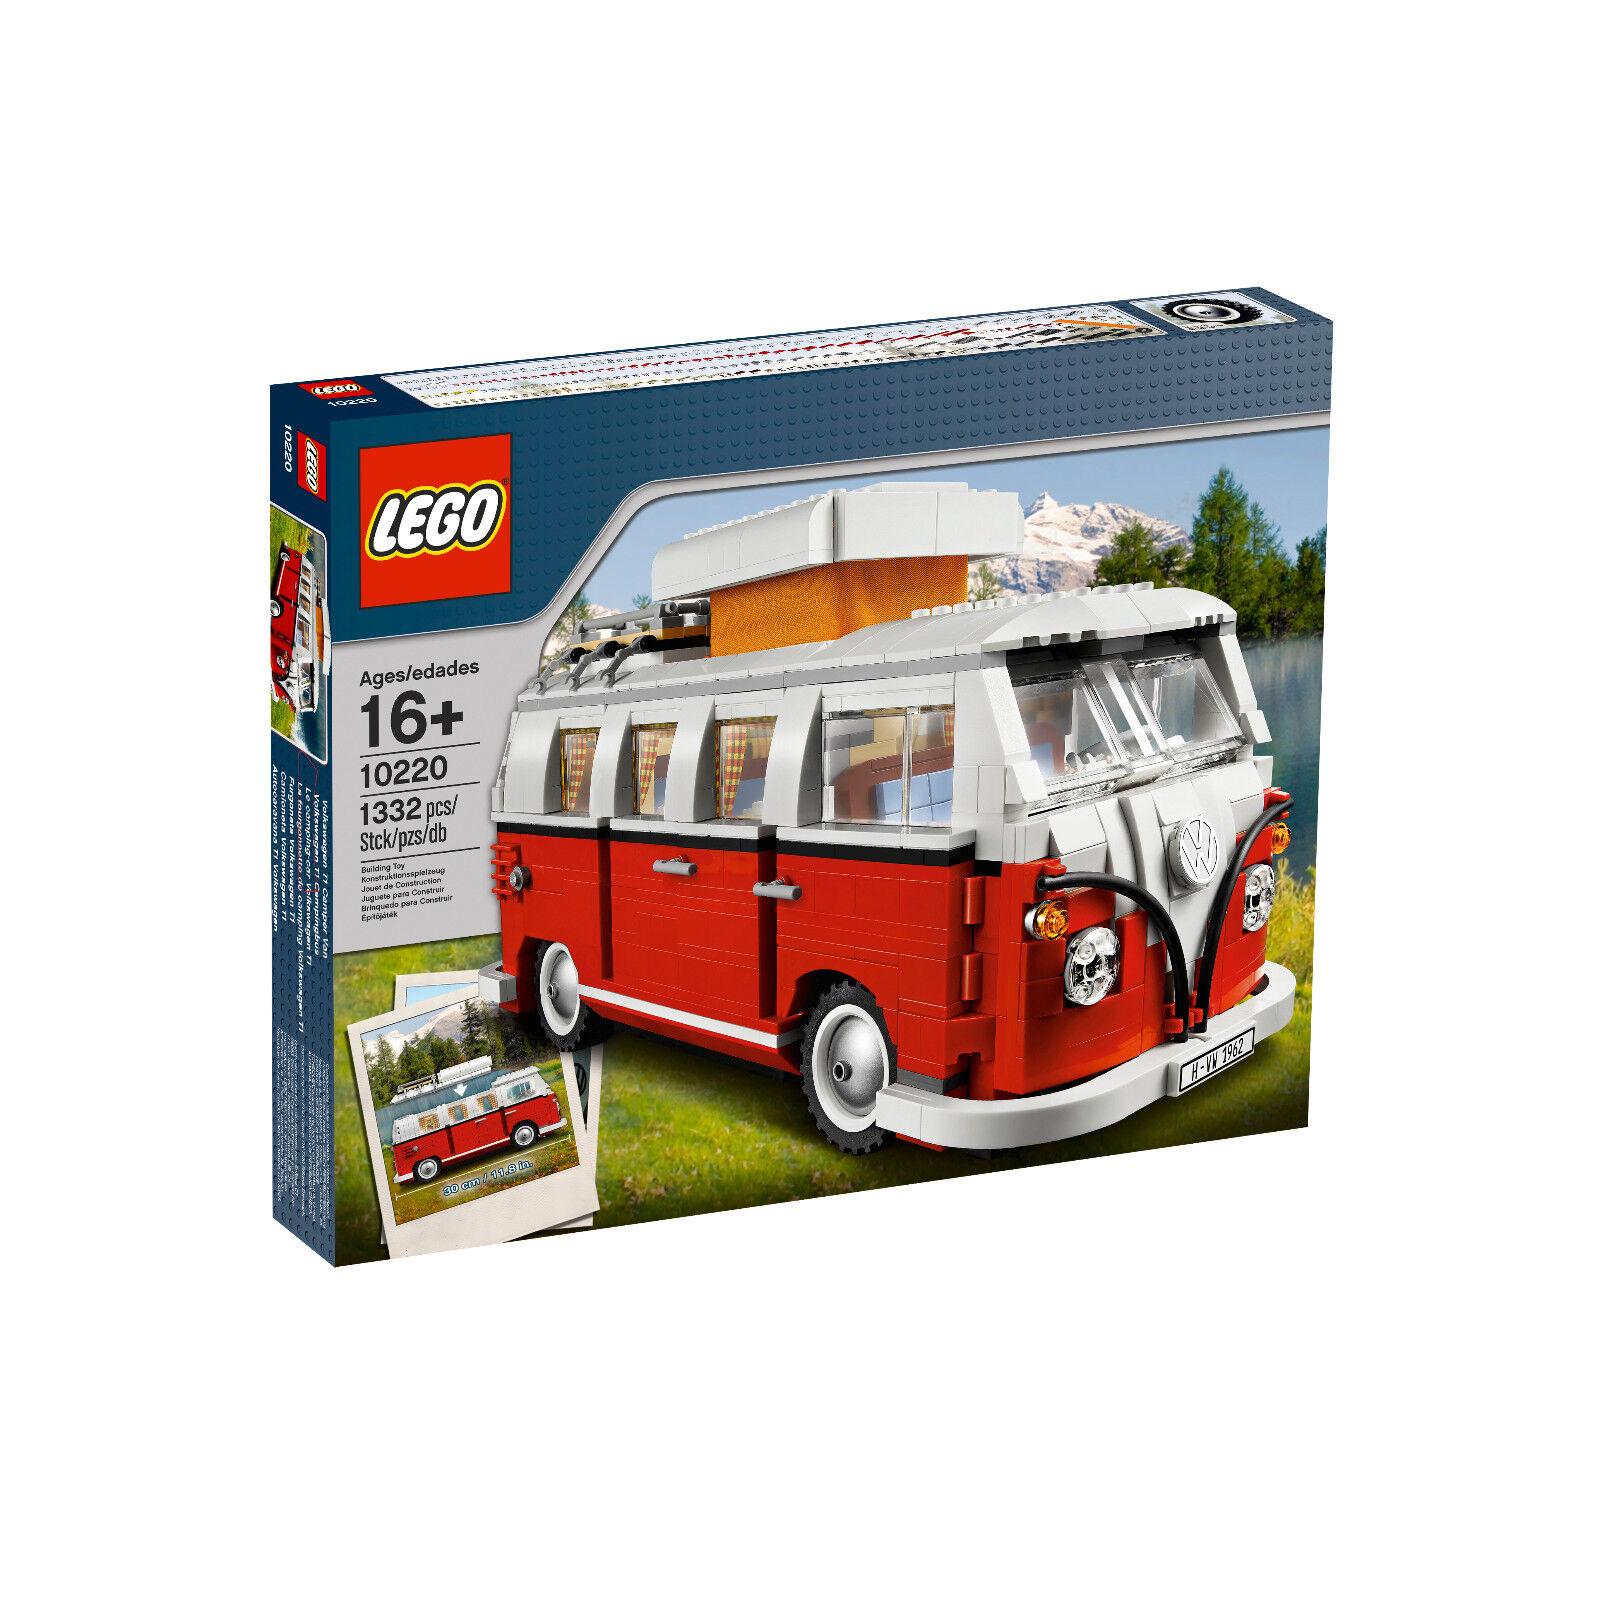 Original volkswagen LEGO t1 camionnette 211099320 bl9 consomme 10220 Creator Creator Creator Camper e6522a